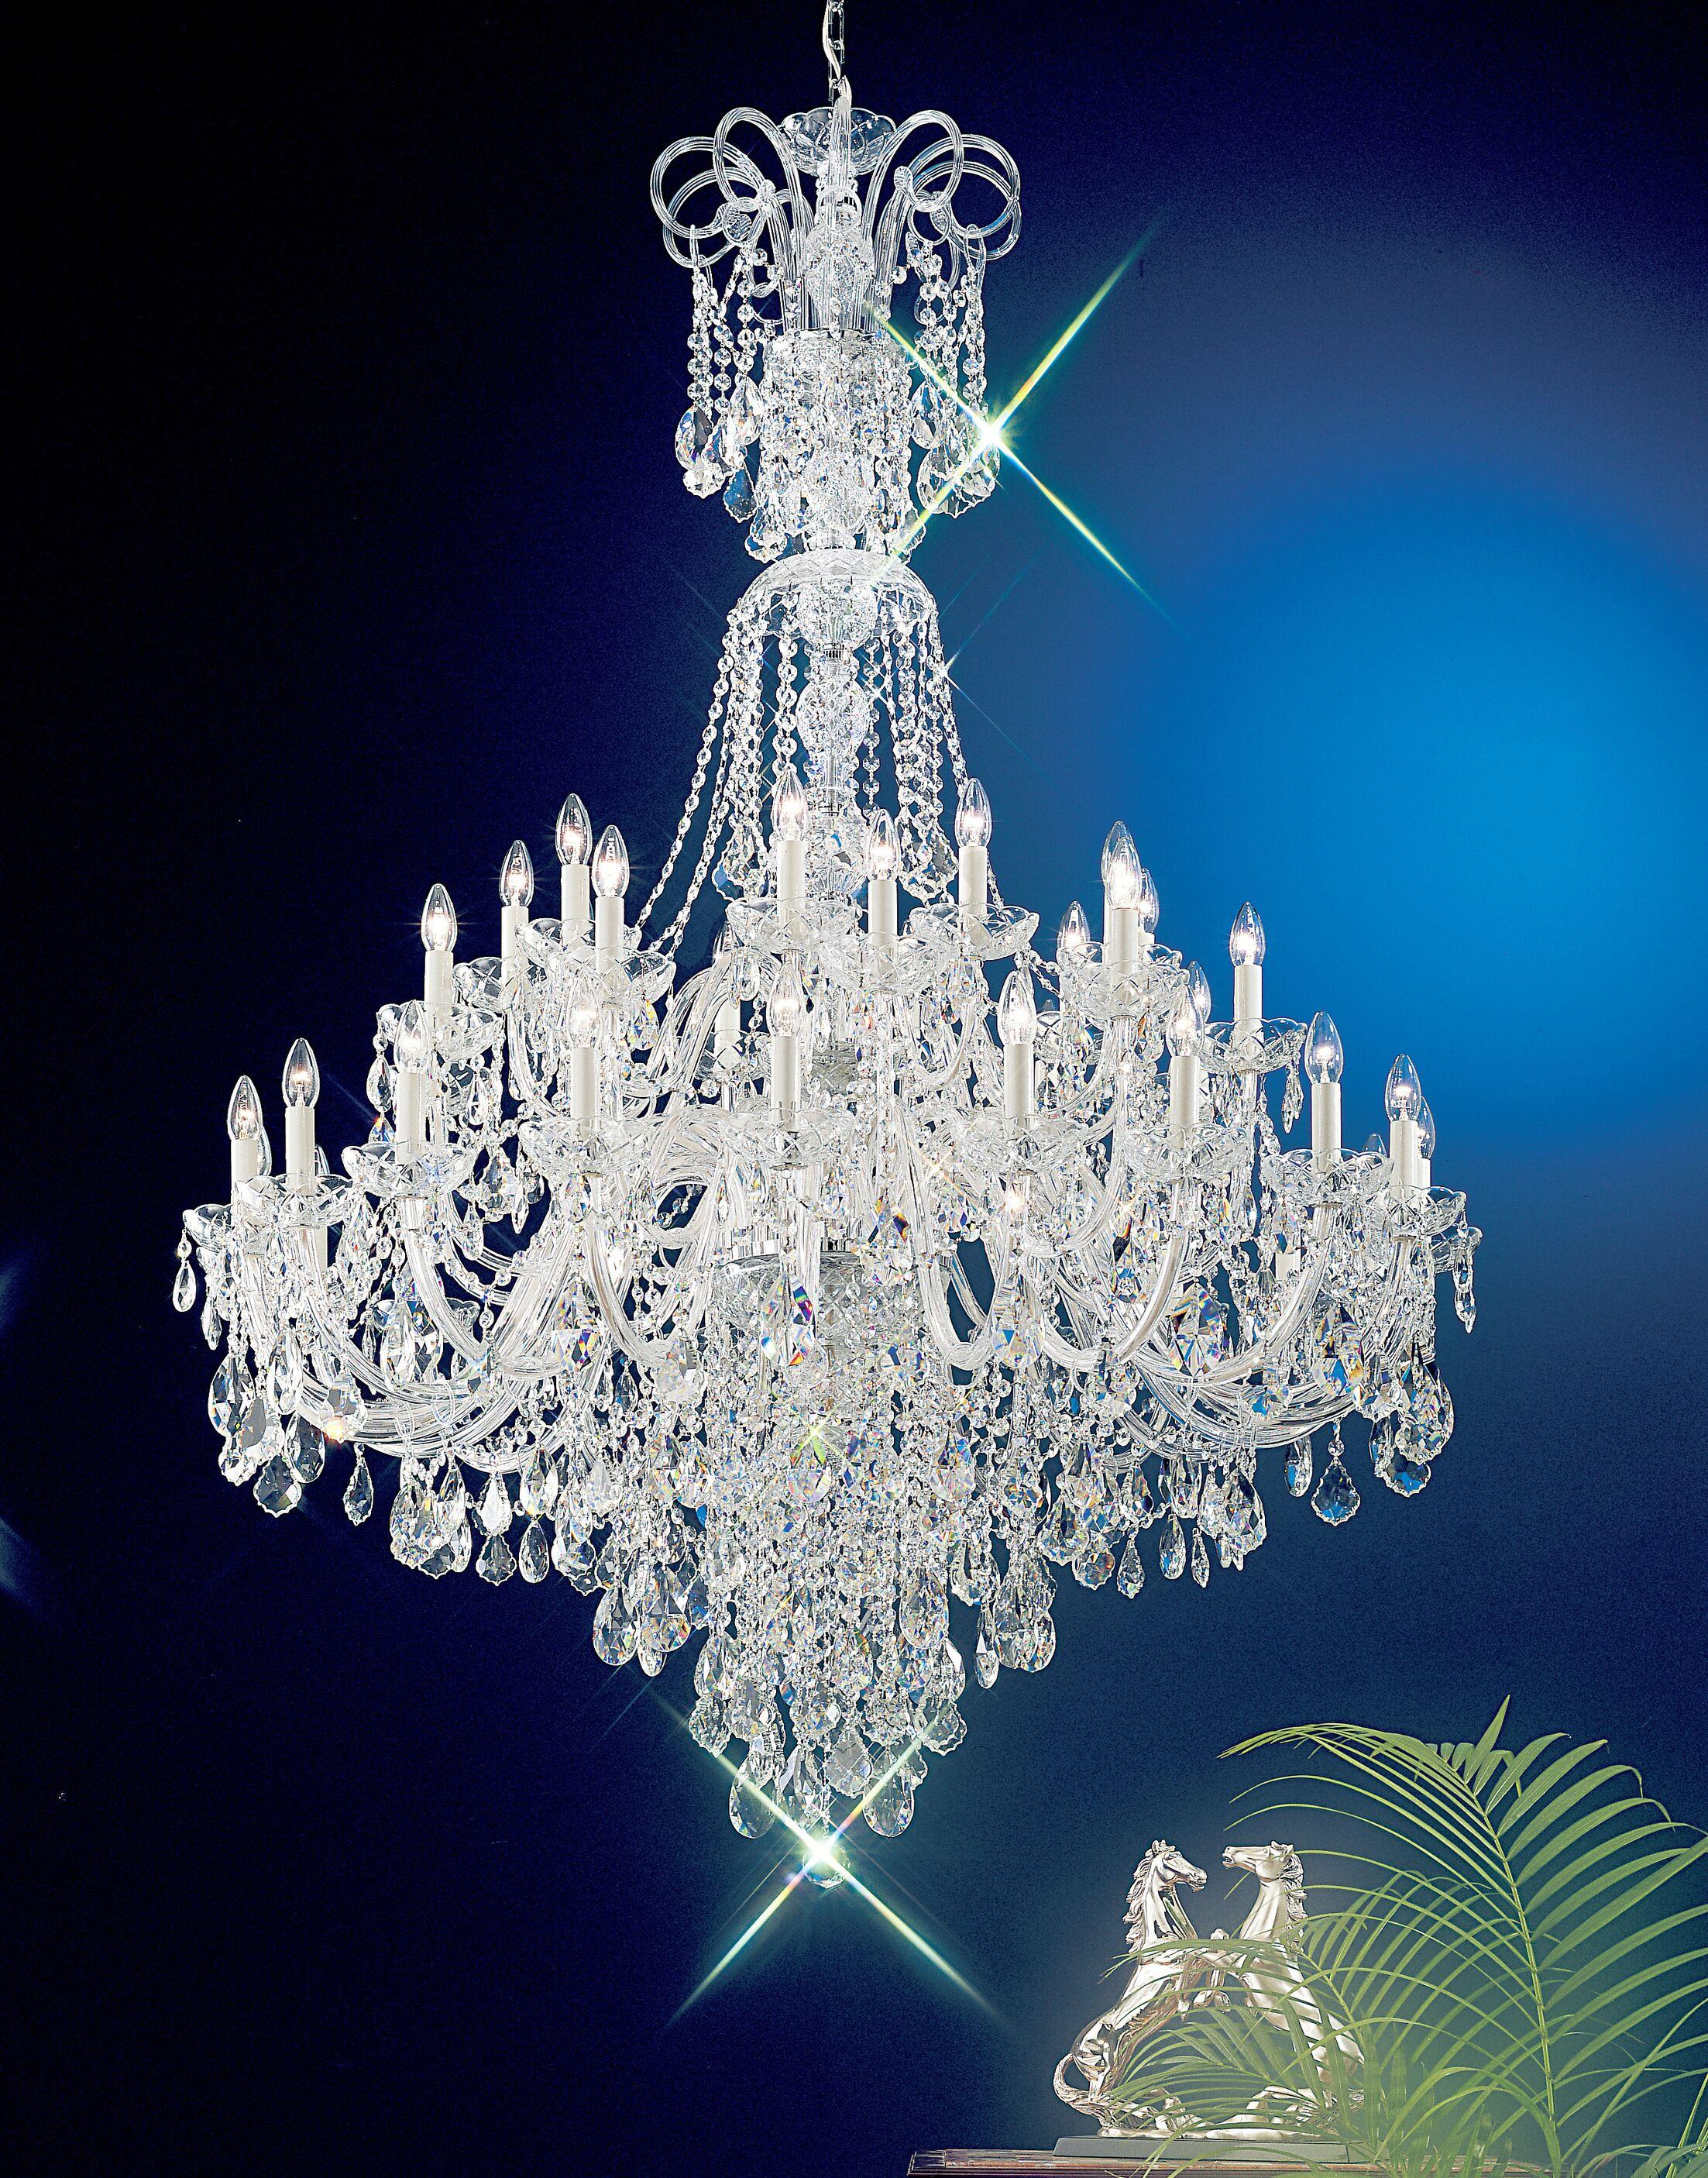 Bohemia 40-Light Candle Style Chandelier Crystal Type: Swarovski Elements, Finish: 24K Gold Plate